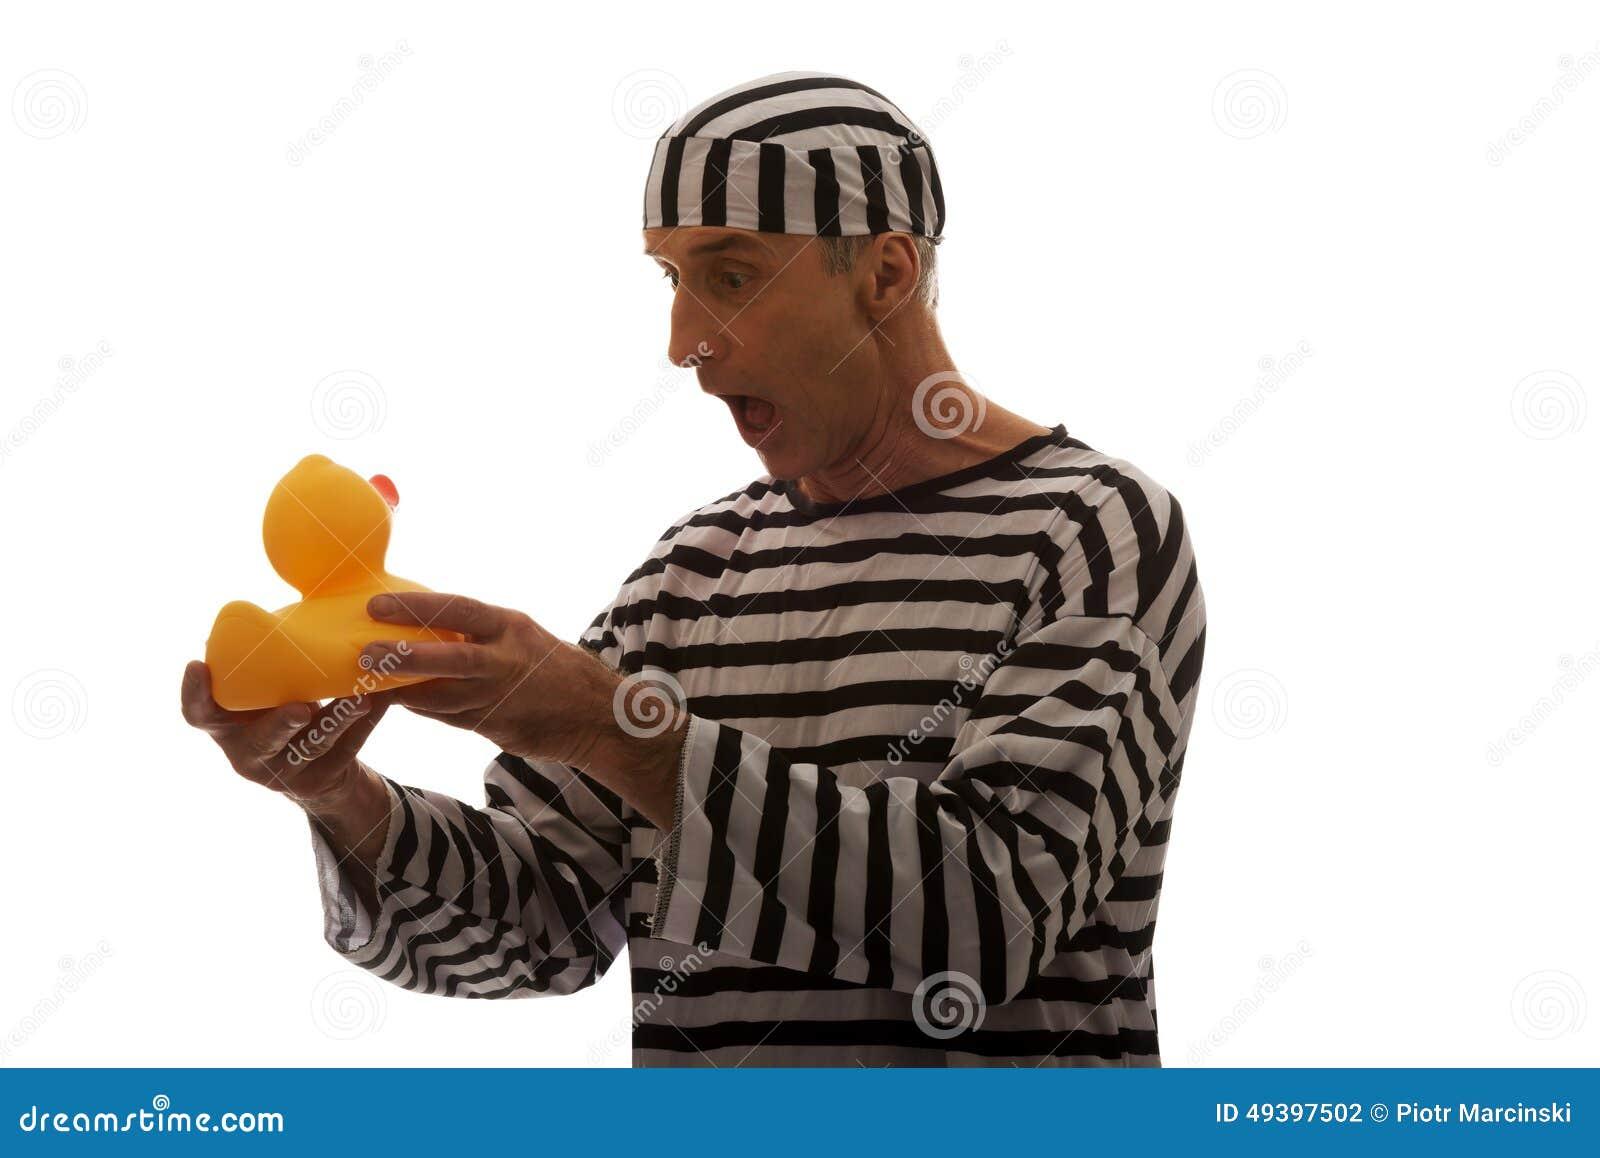 Caucasian man prisoner criminal with rubber duck